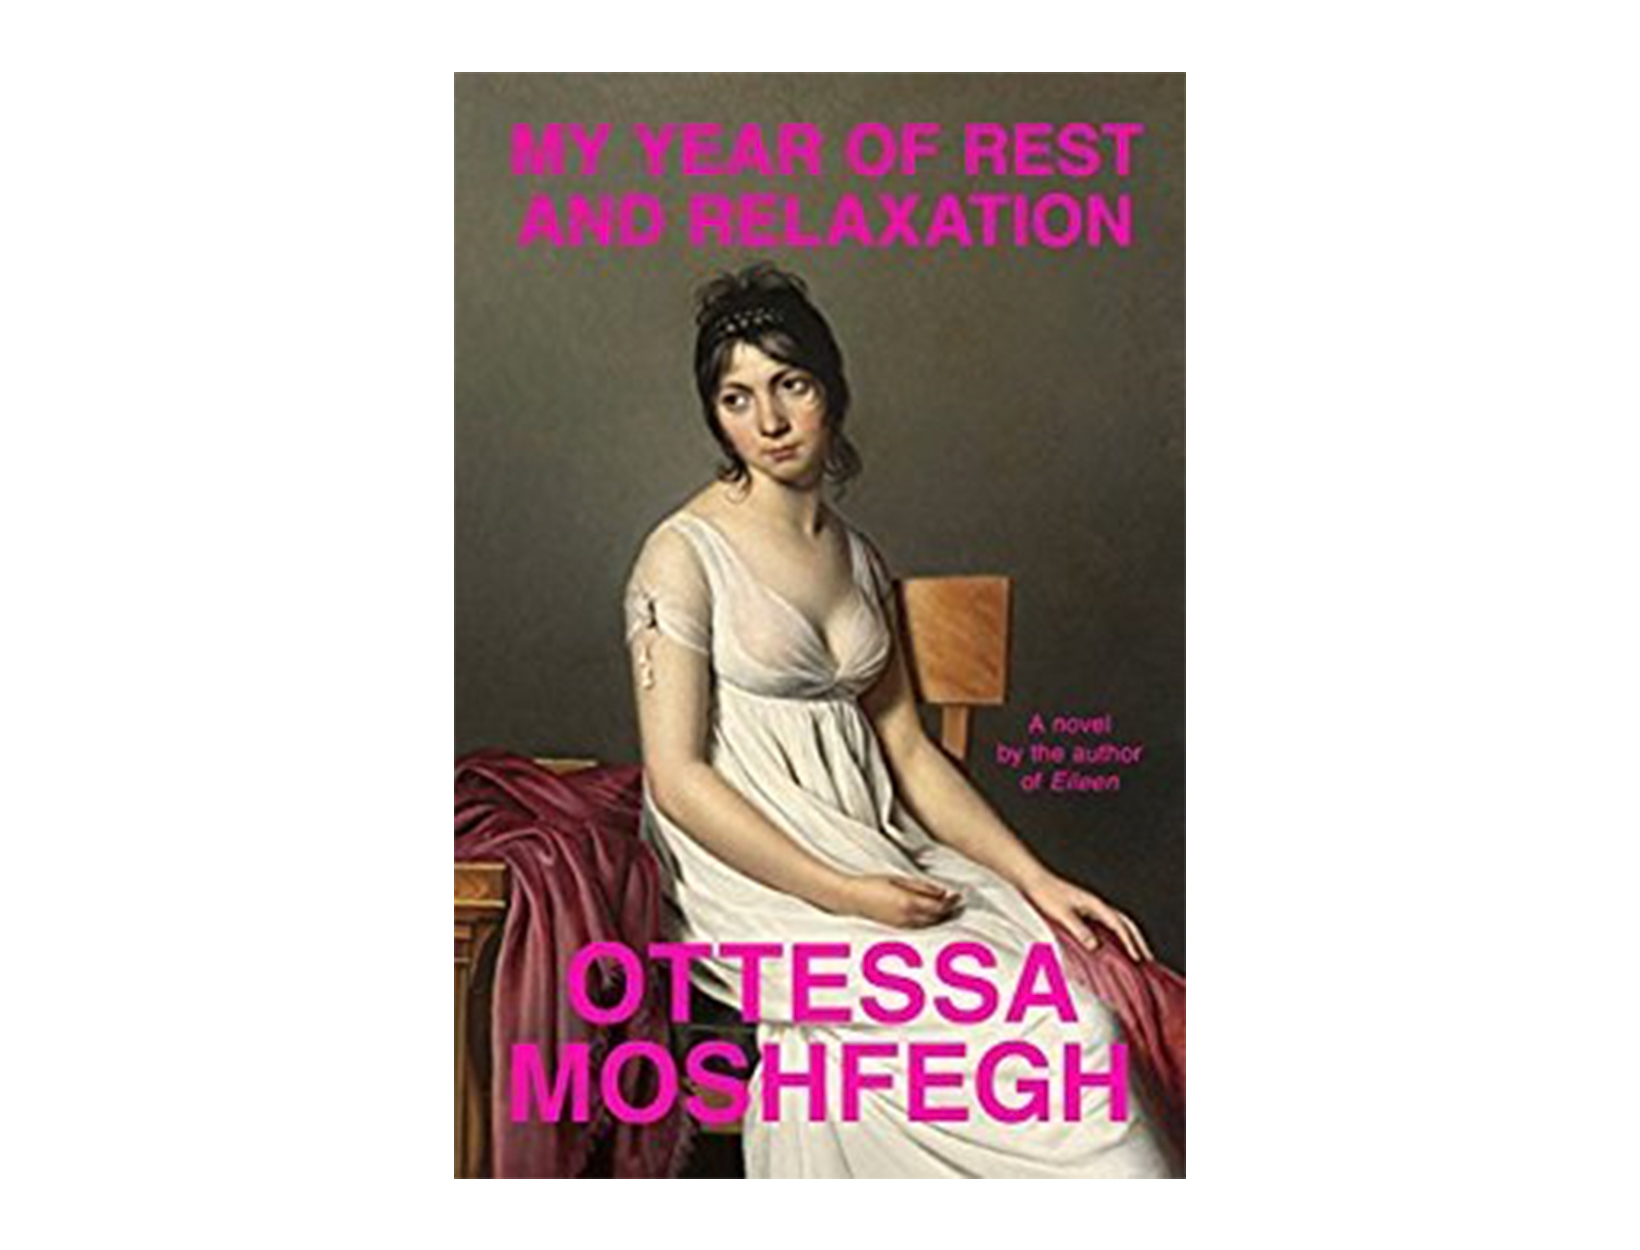 <em>tarafından Ottessa Moshfegh